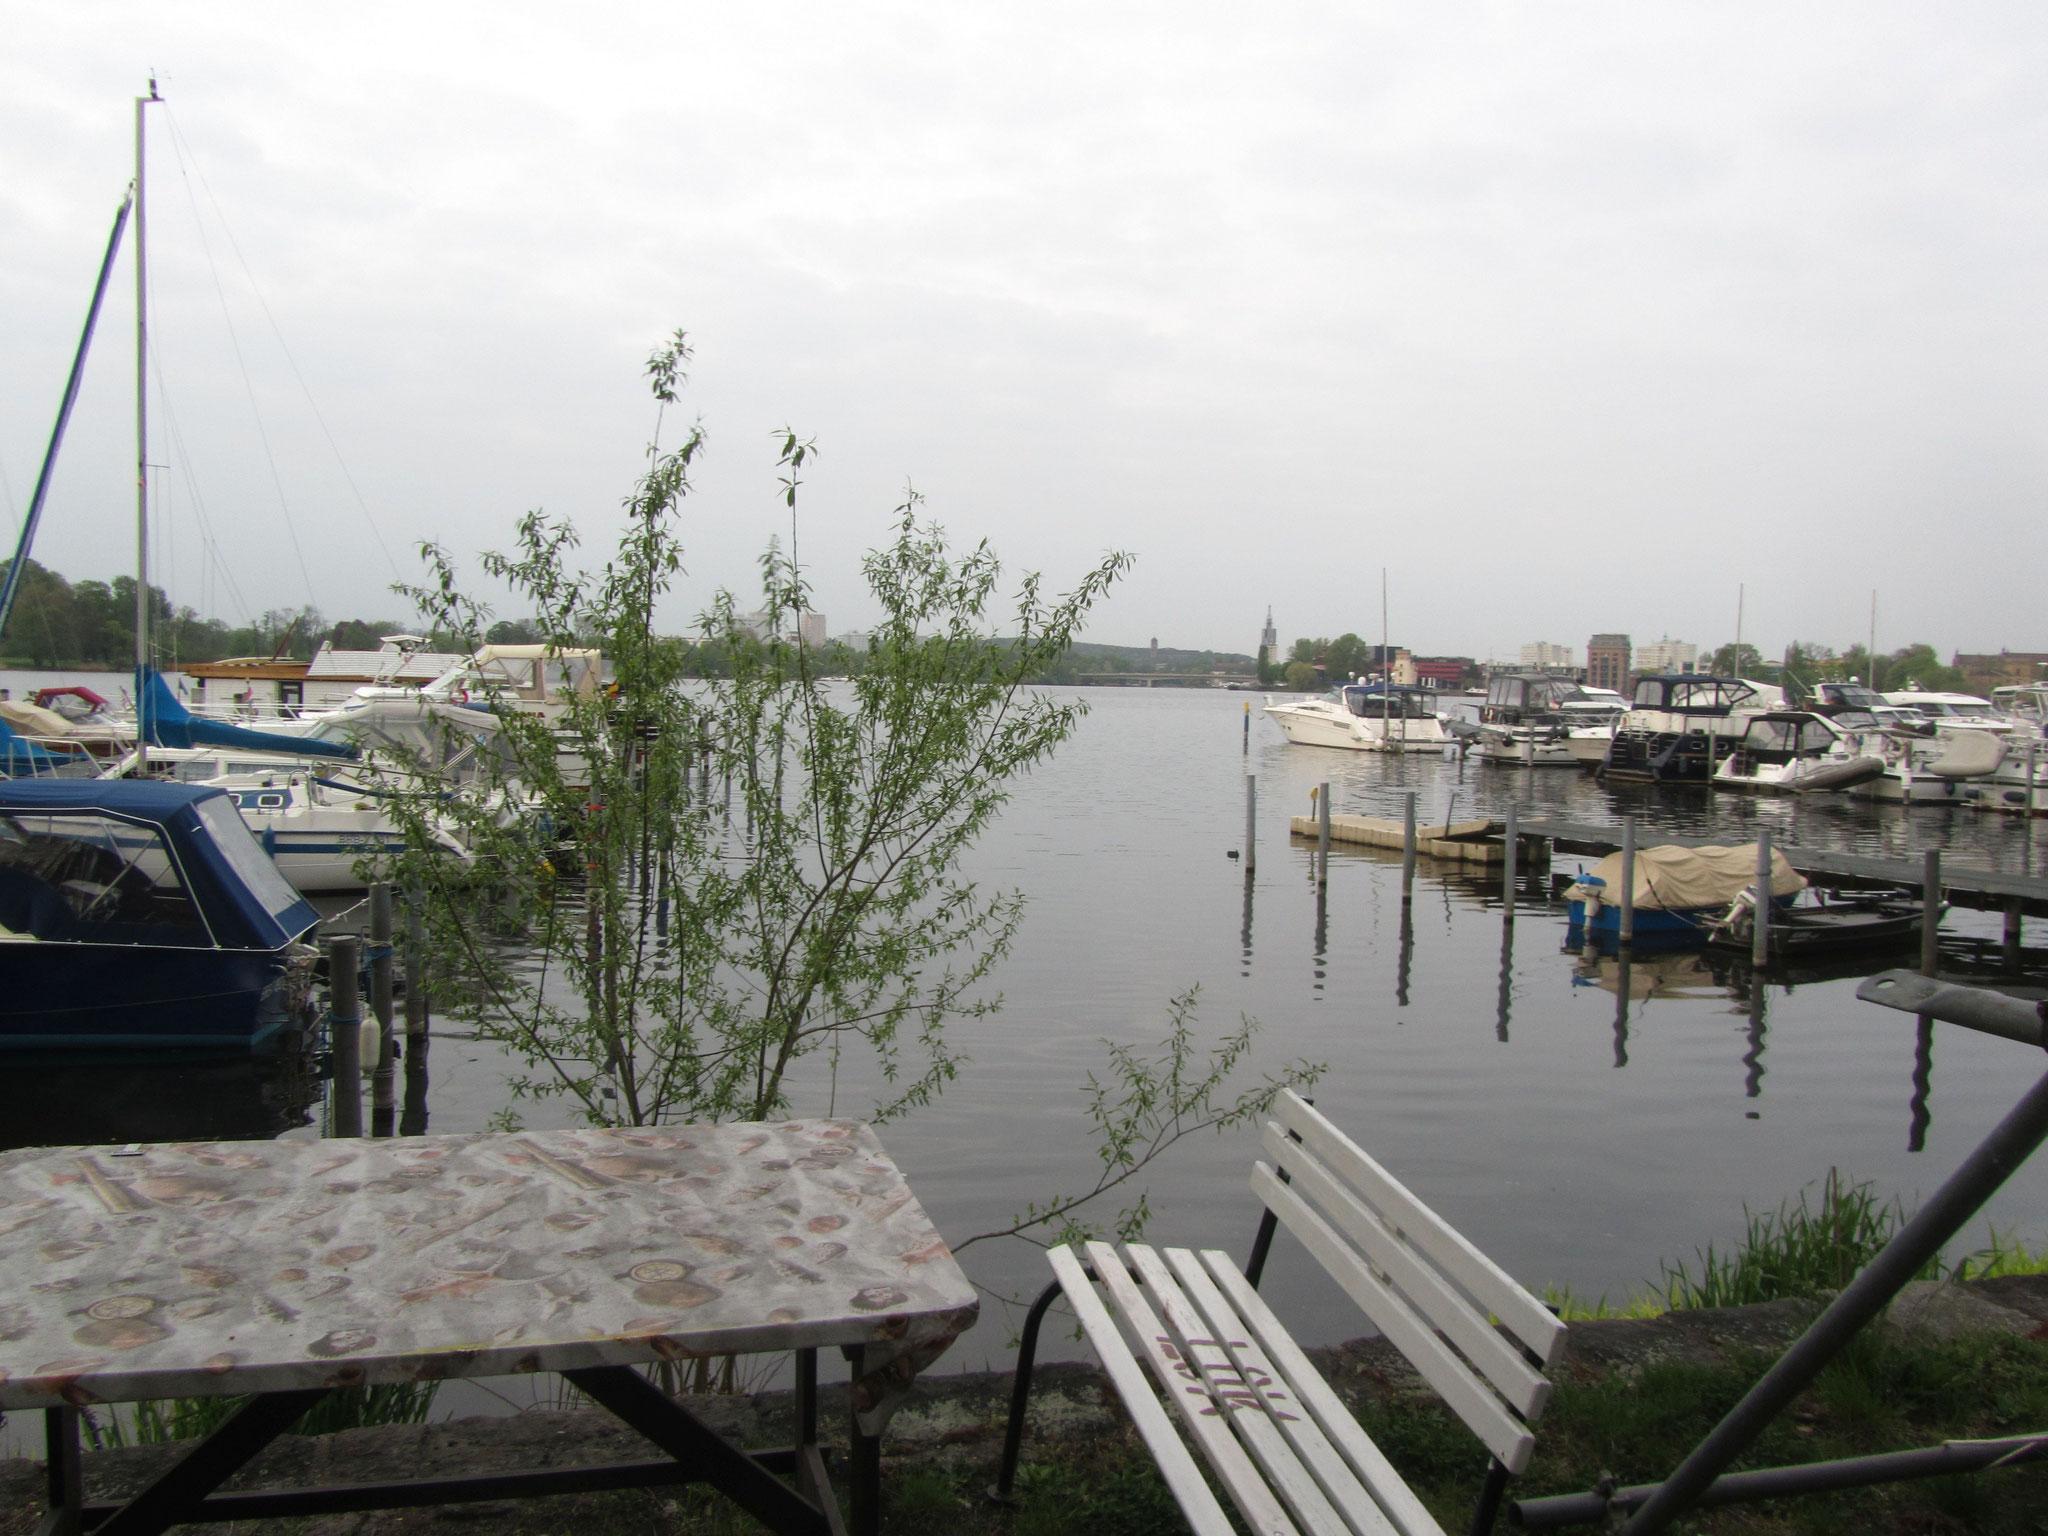 Hafen Potsdam